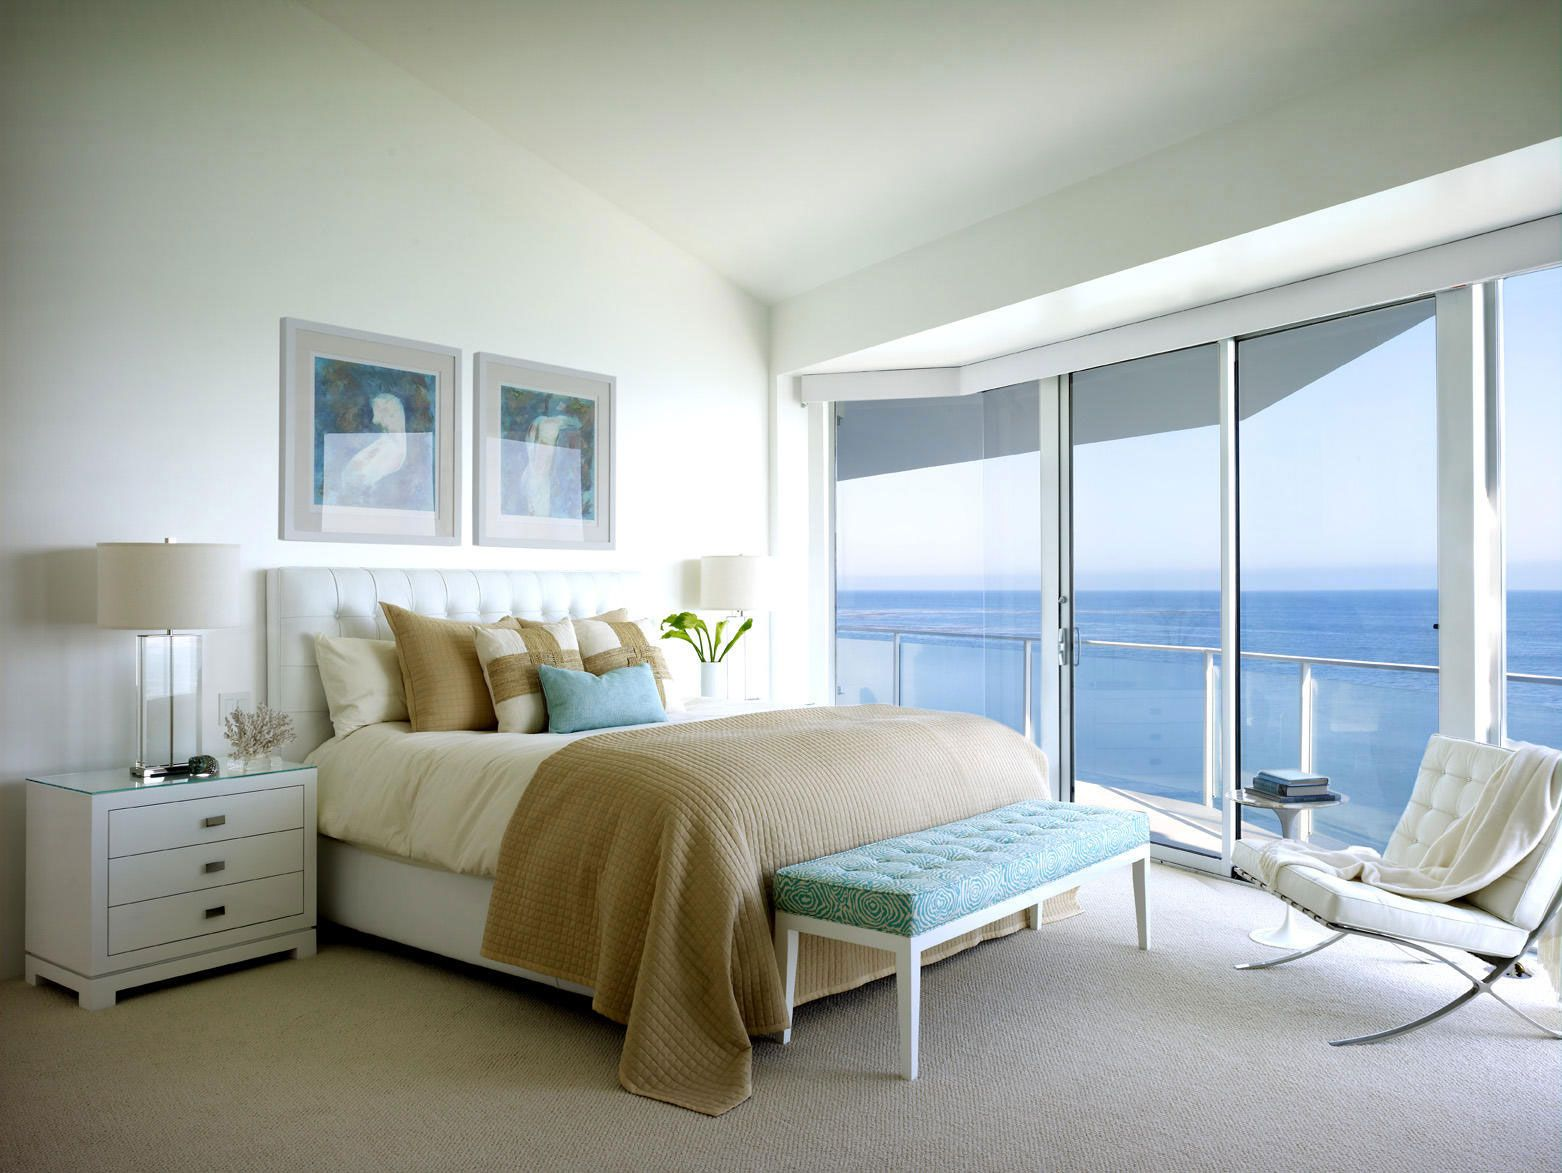 25 Best Master Bedroom Interior Design Ideas Beach House